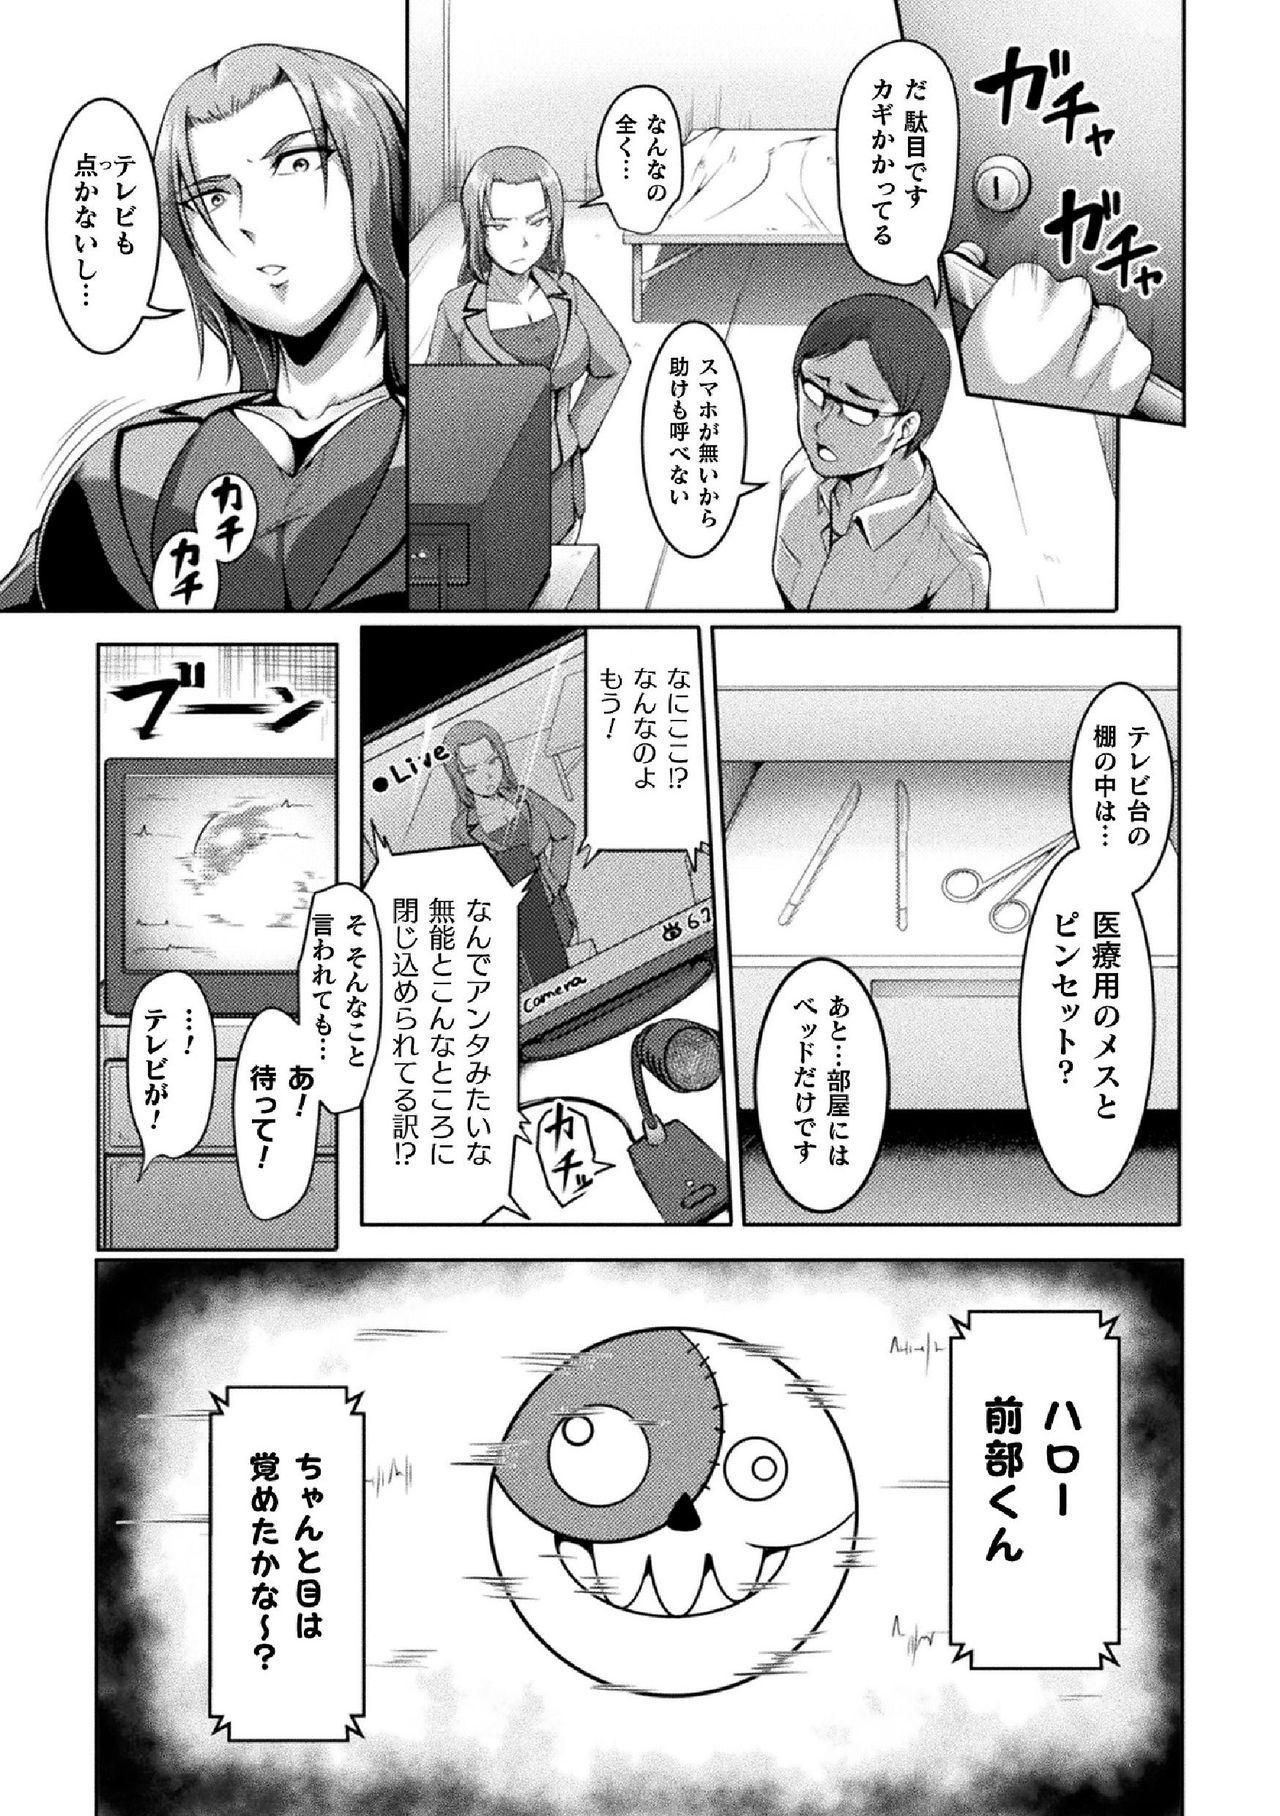 2D Comic Magazine Namaiki Onna ni HaraPun Seisai! Vol. 2 48